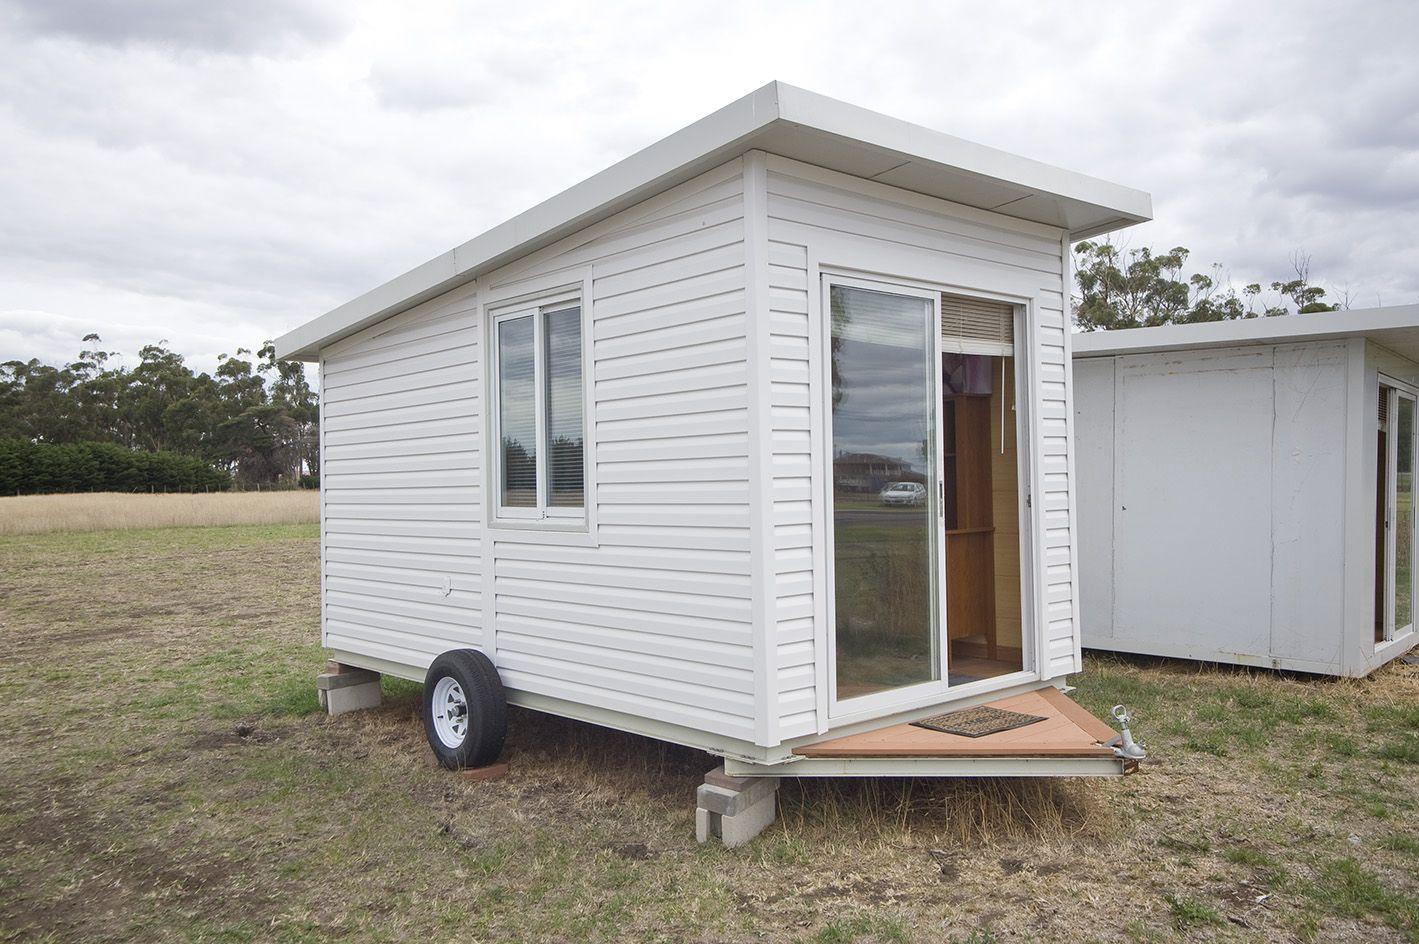 Pre Fab Home Mobile Luxury Prefabricated Tiny House Trailer On Wheels Tiny House Trailer Prefab Homes Diy Tiny House